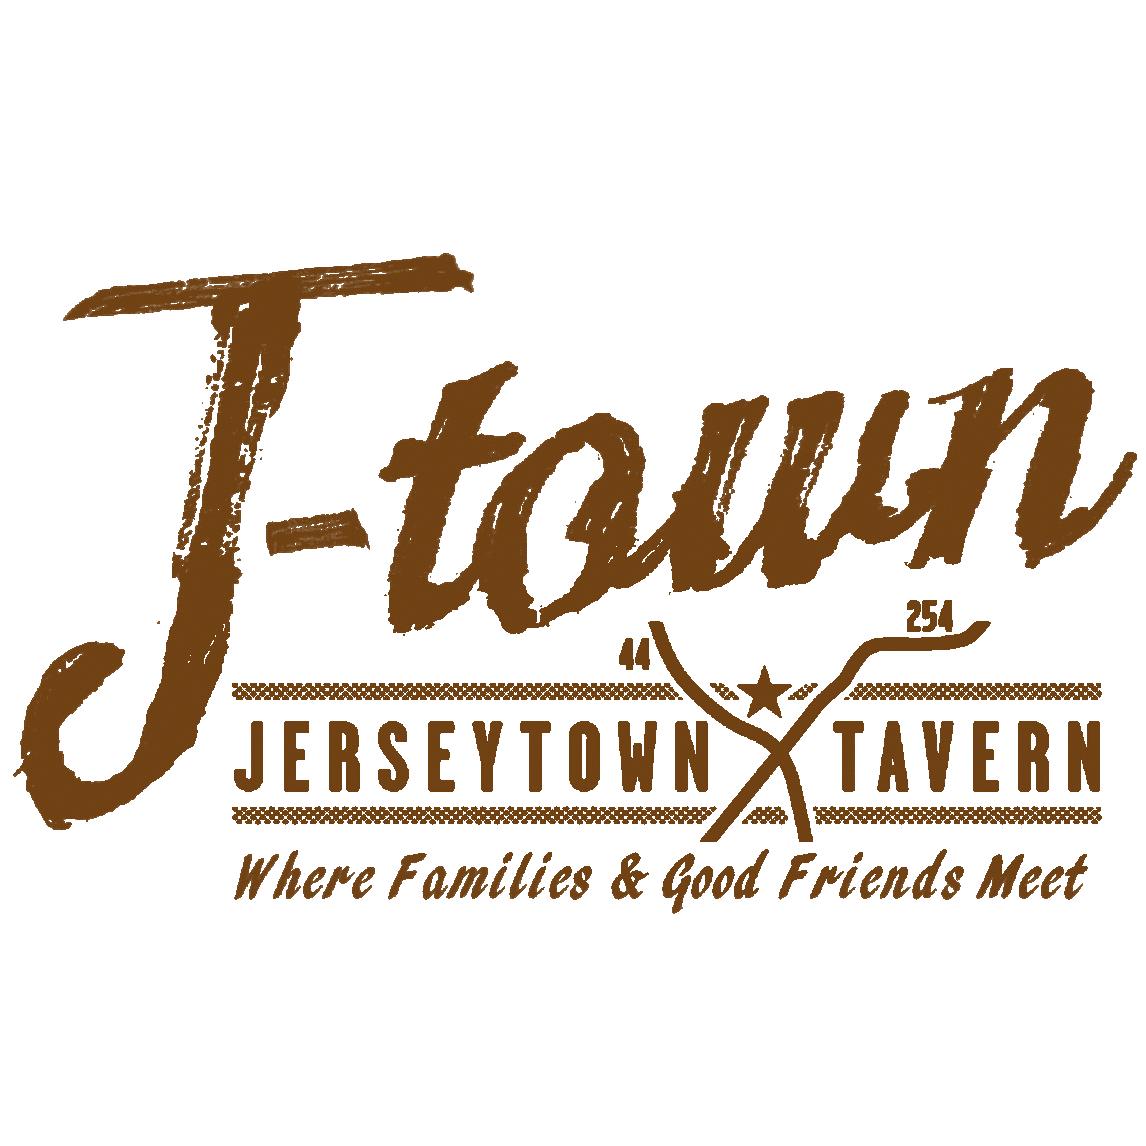 Jerseytown Tavern